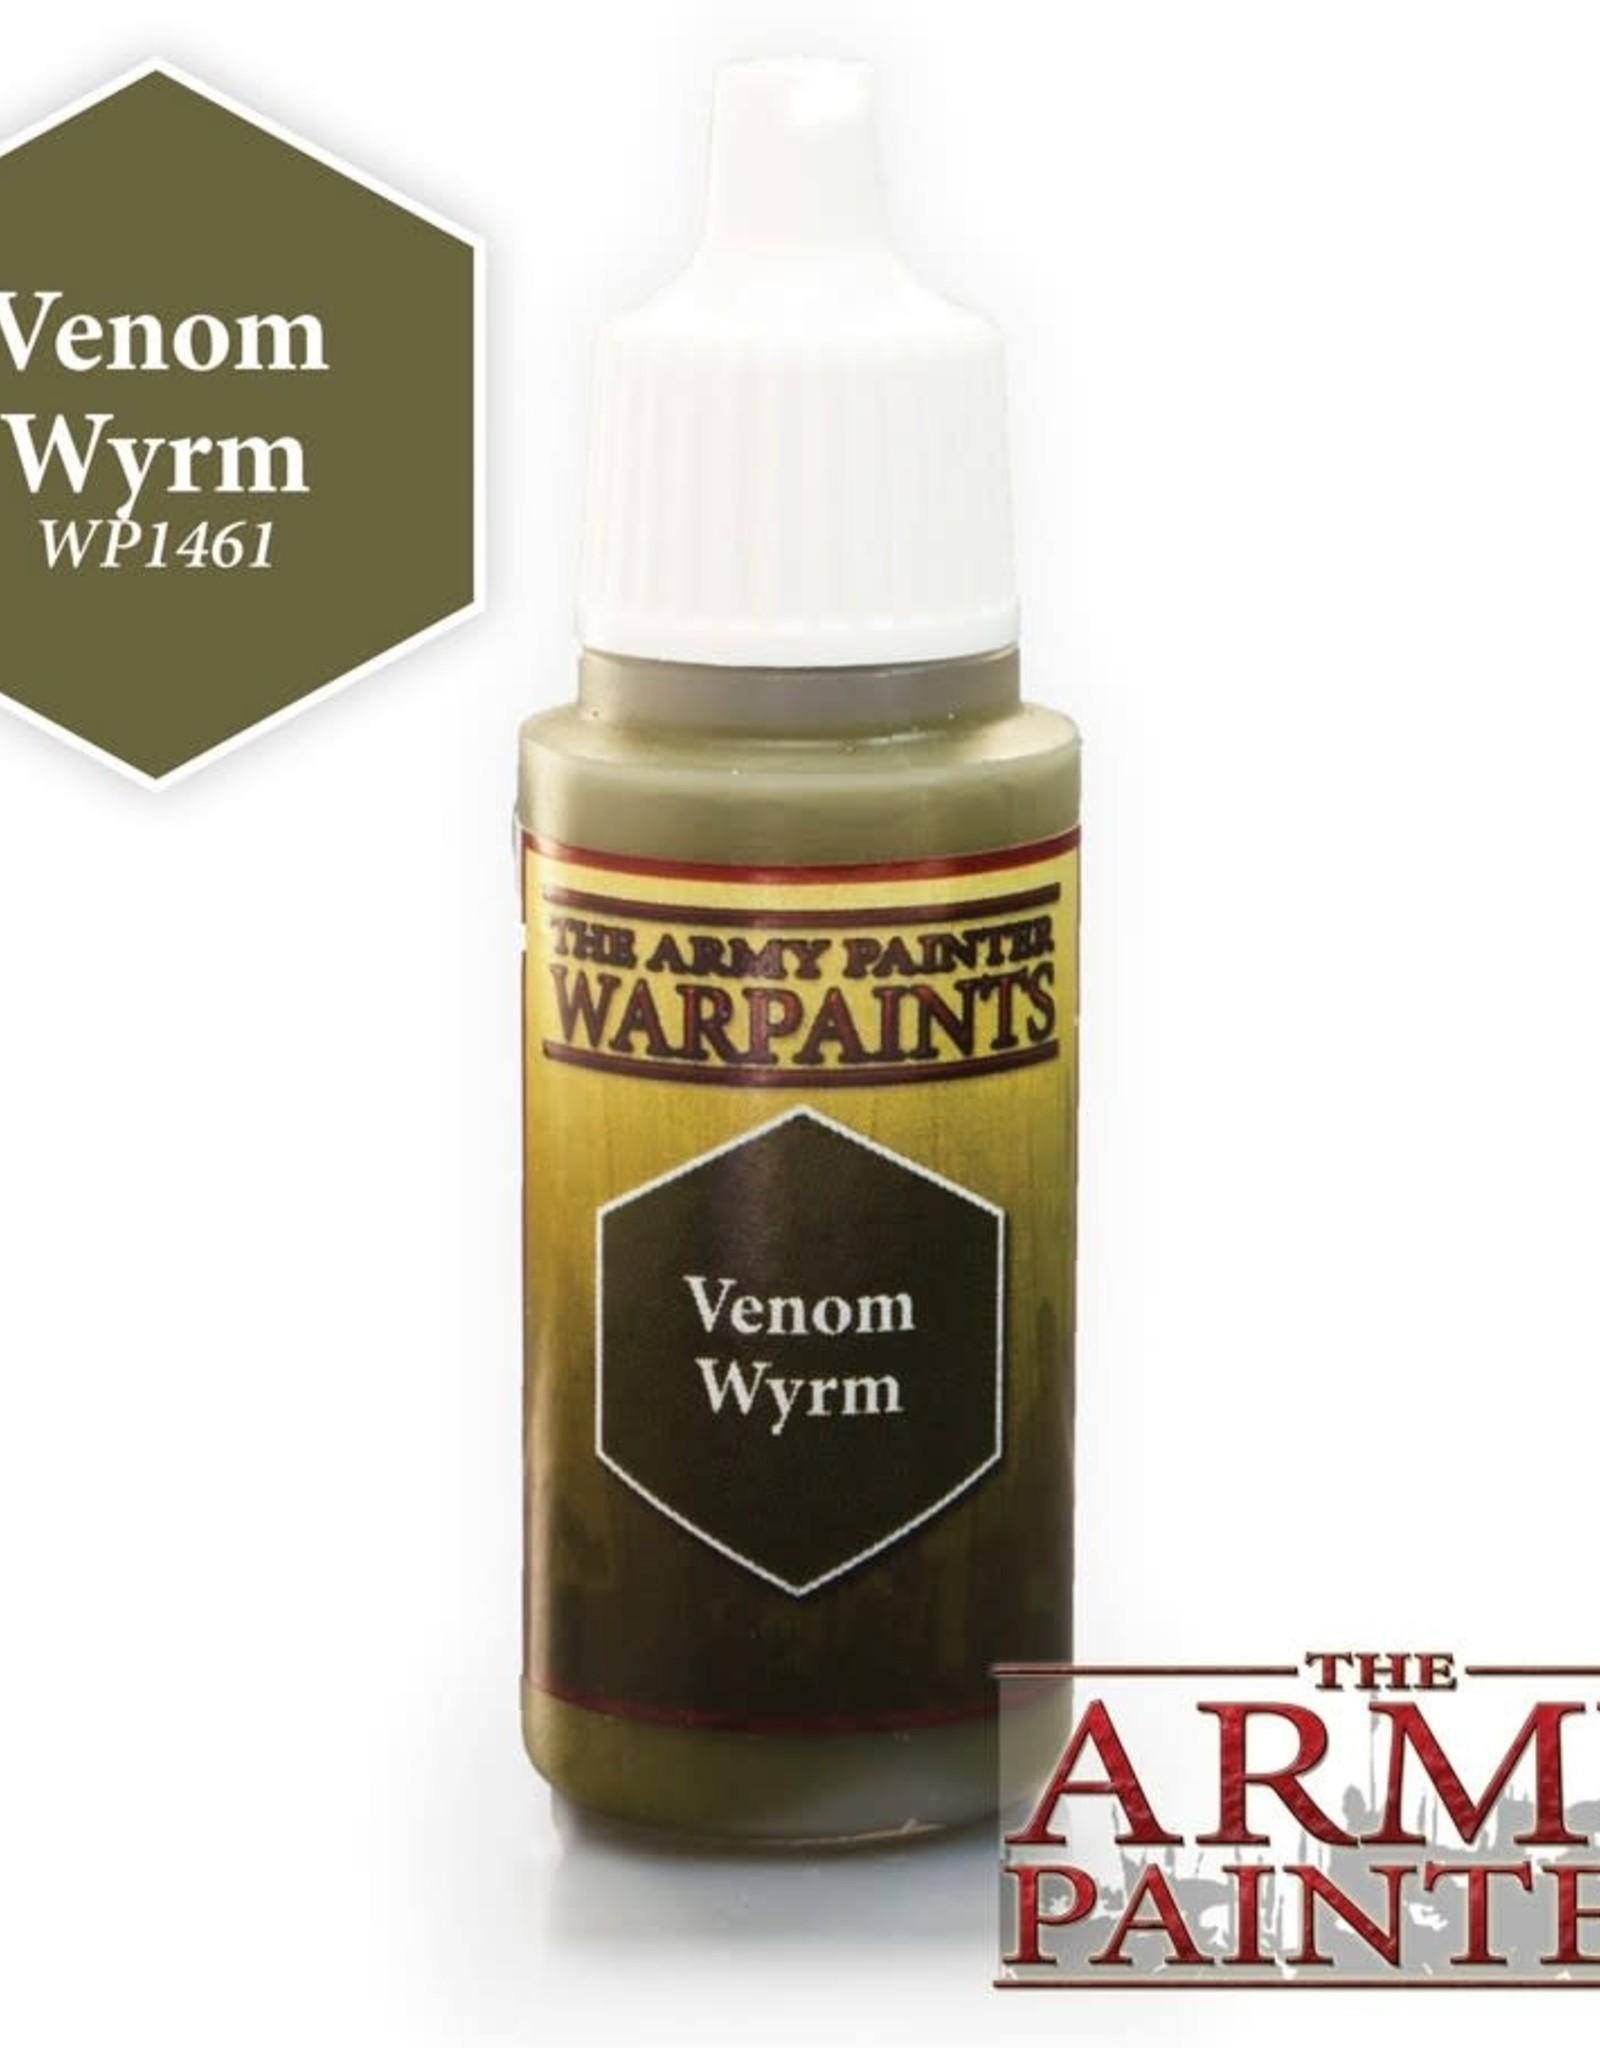 Warpaints: Venom Wyrm